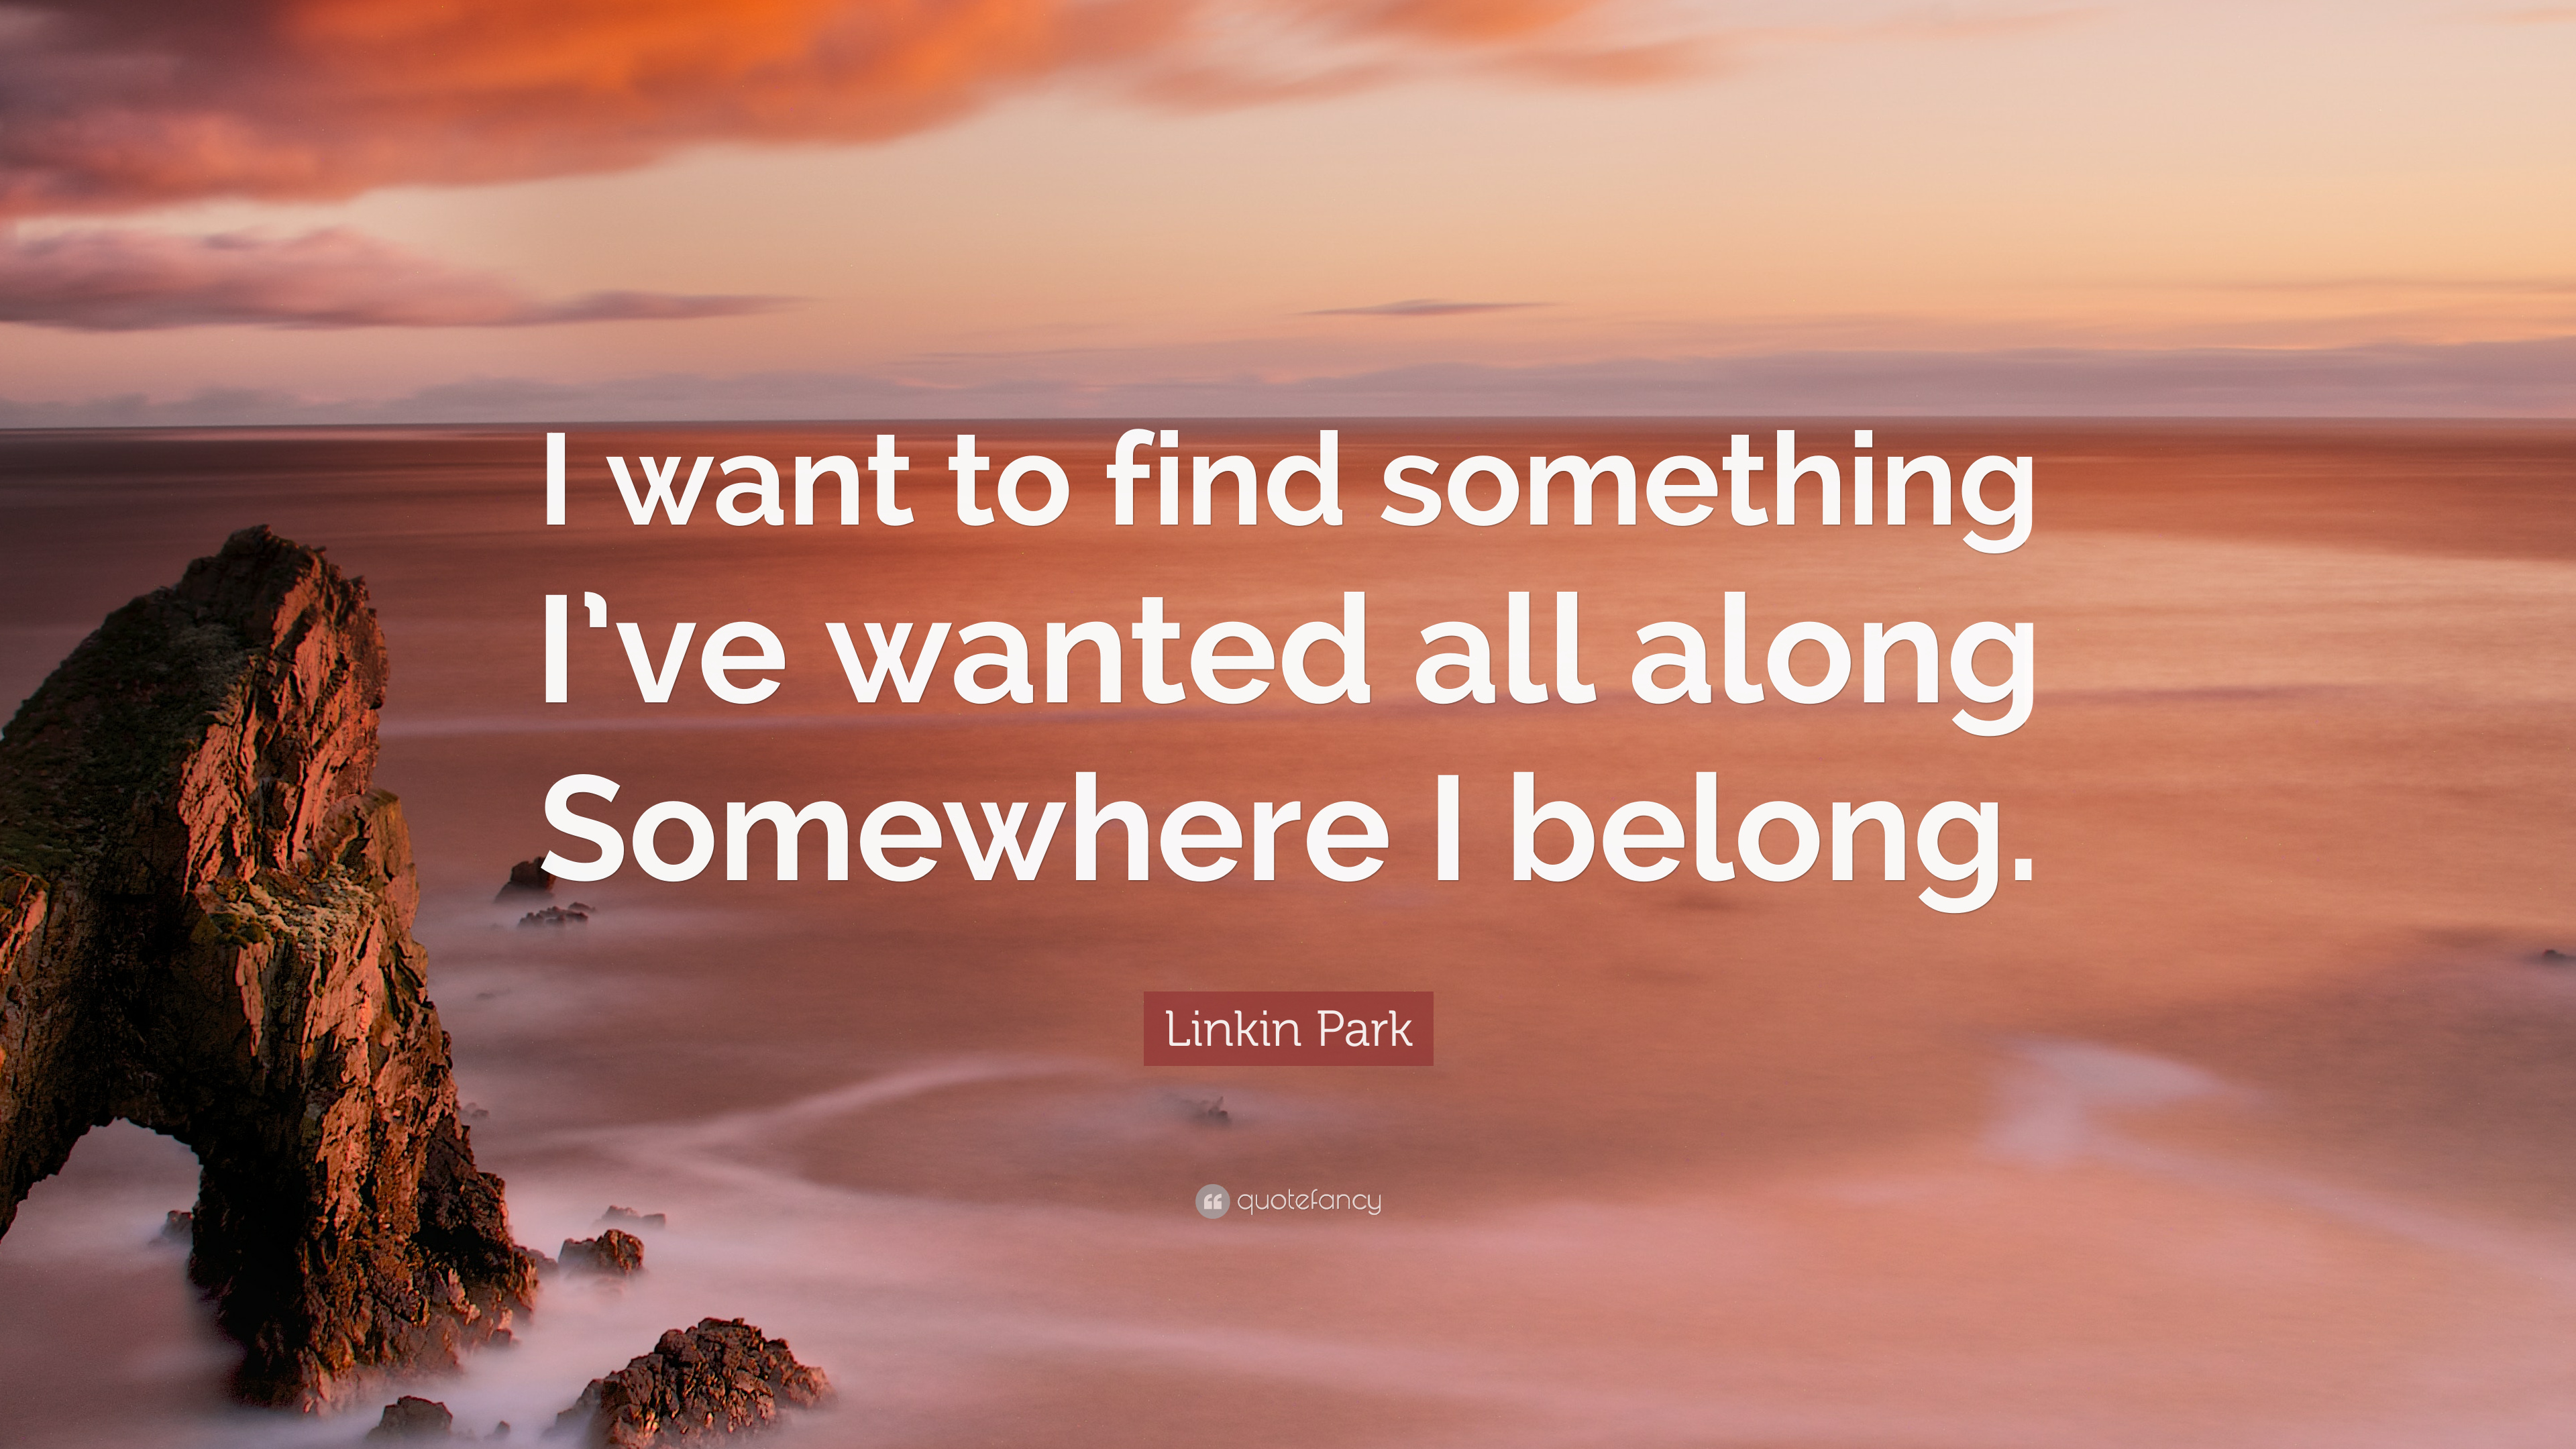 Linkin Park - Somewhere I Belong Lyrics